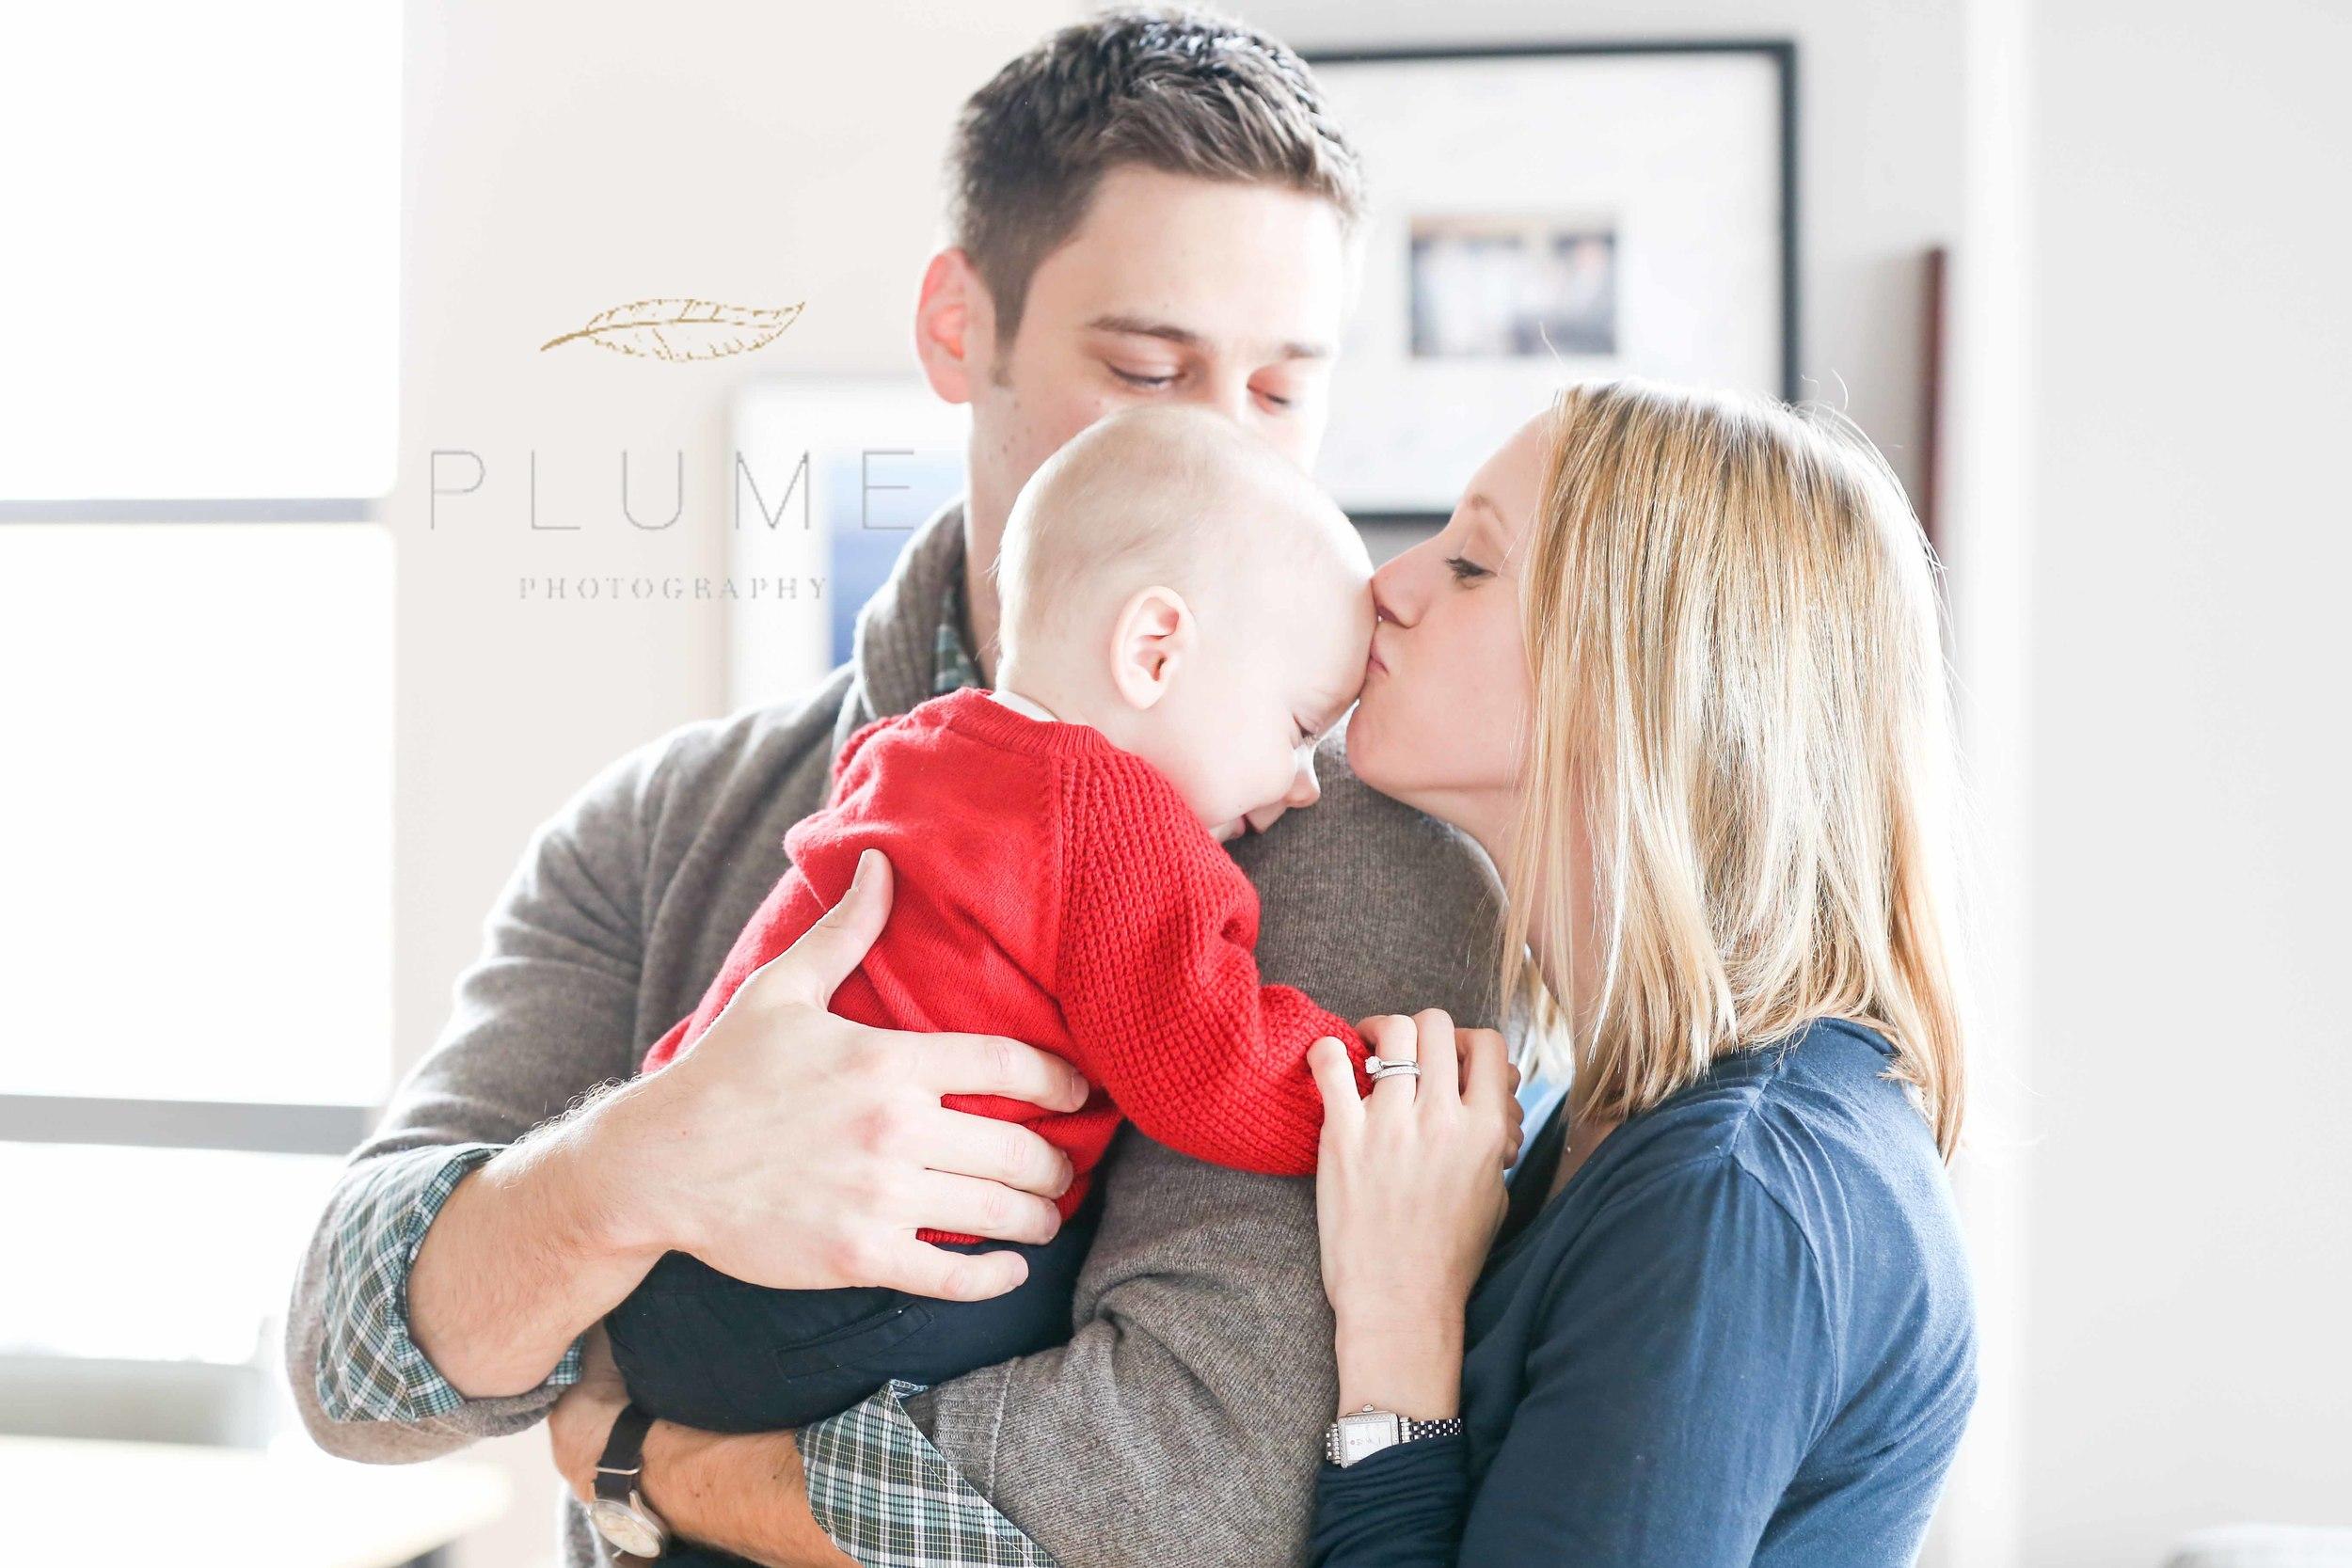 Matt, Anne and Logan Gialanella at home in Washington, DC, Sunday, November 2, 2014. Photo by Amanda Reynolds